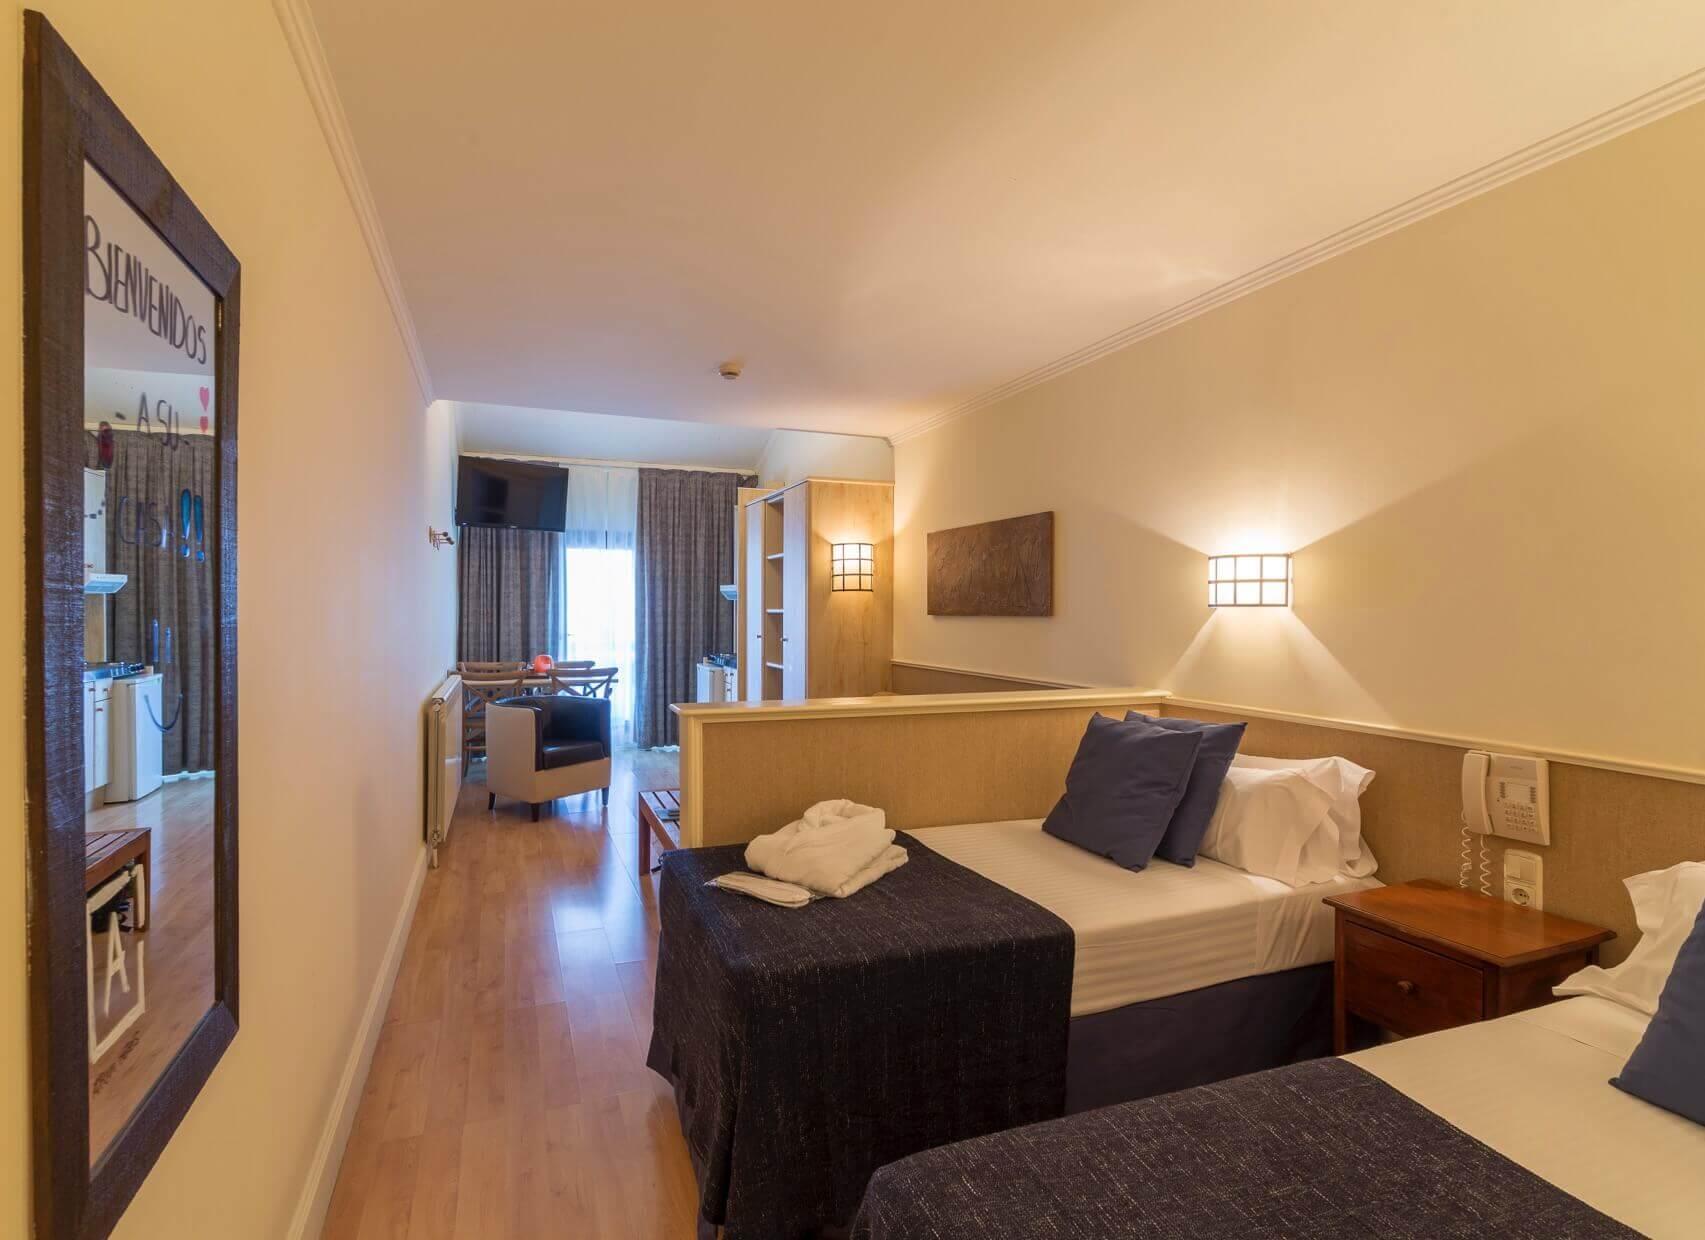 Patagonia atiram hotel 4 arinsal andorra web oficial for Habitaciones familiares andorra